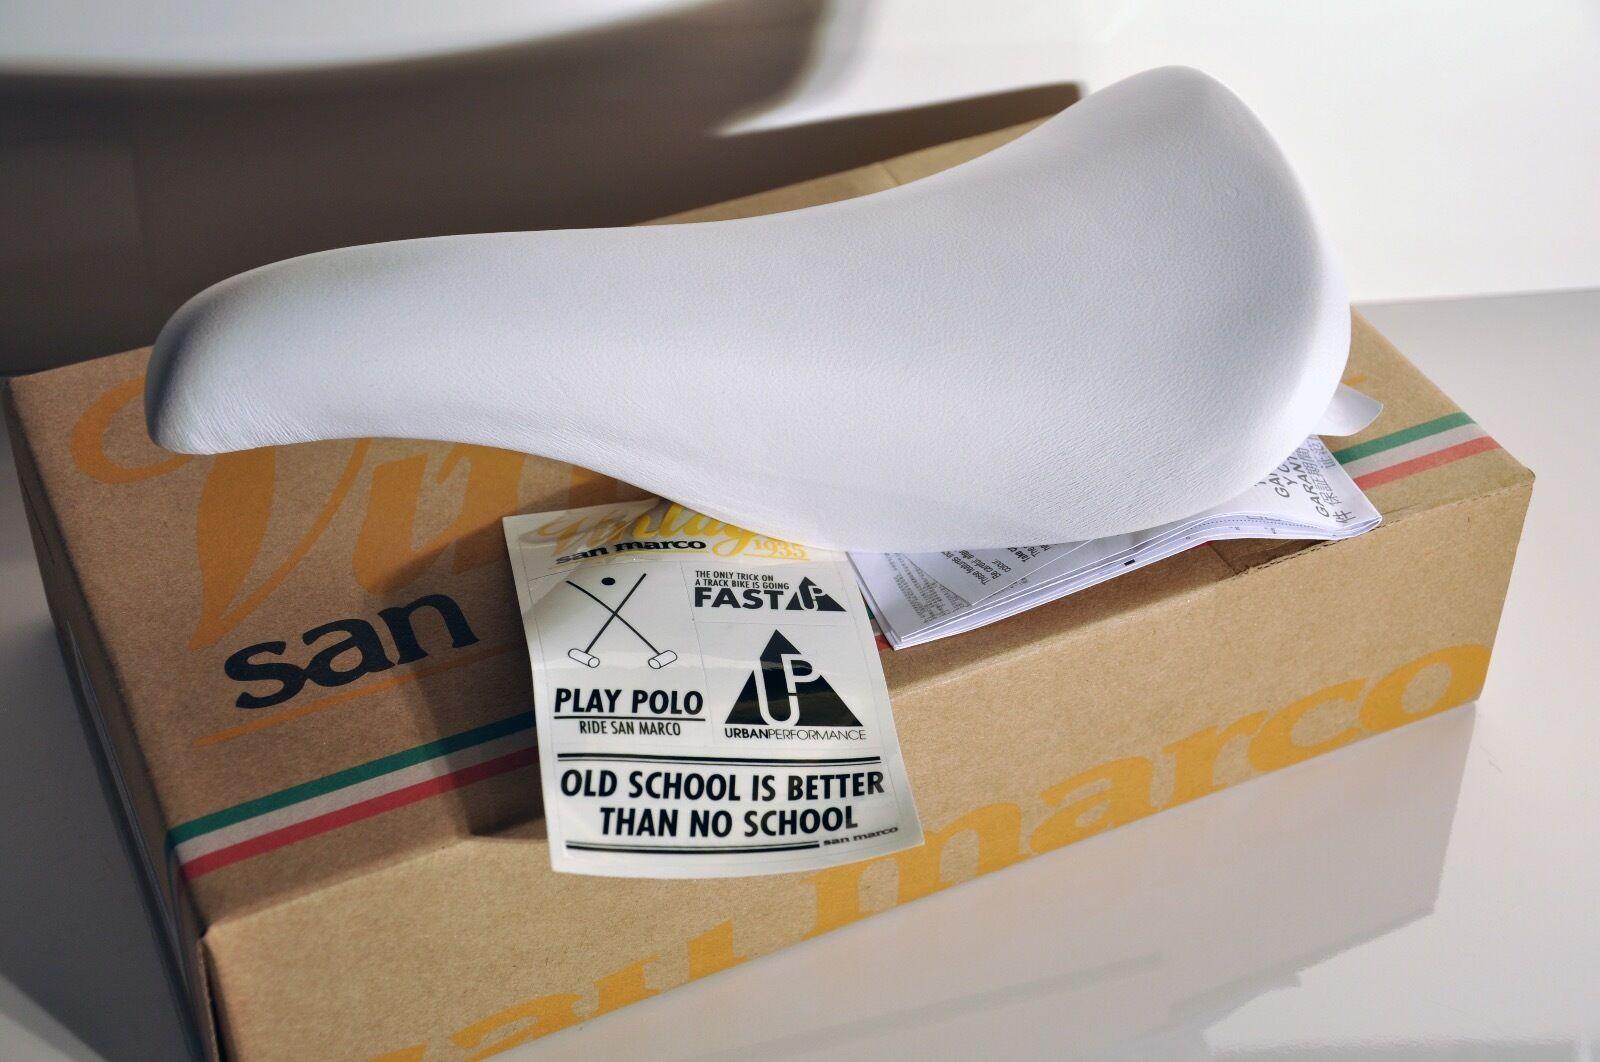 Vintage Selle San Marco Concor Profil Sillin fixie blancoo De Cuero Italia